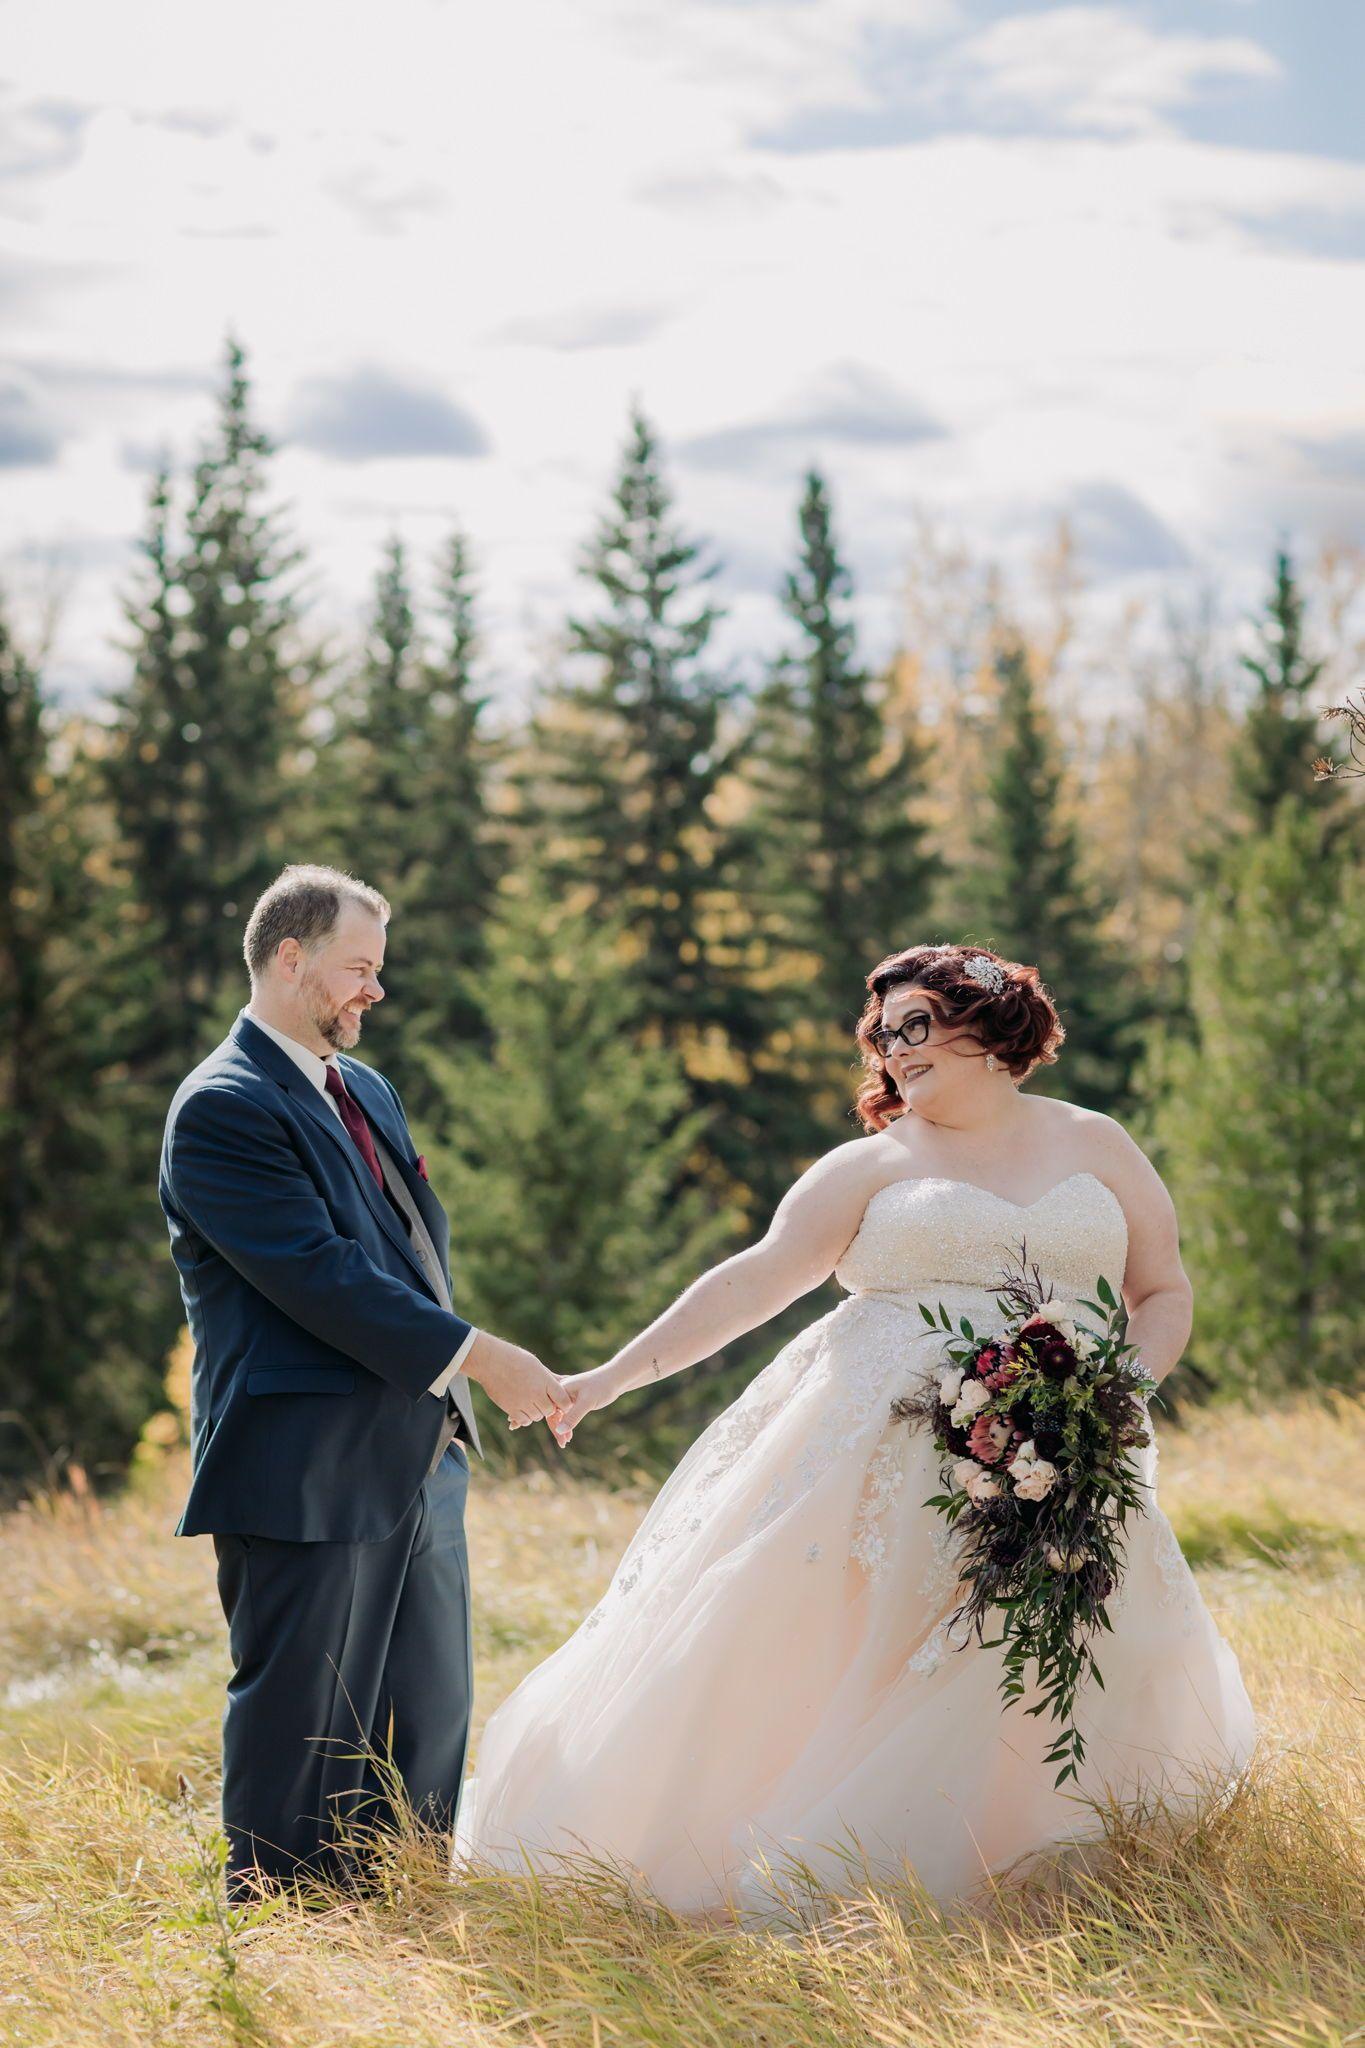 Pin on Edmonton Weddings, Elopements & Engagements